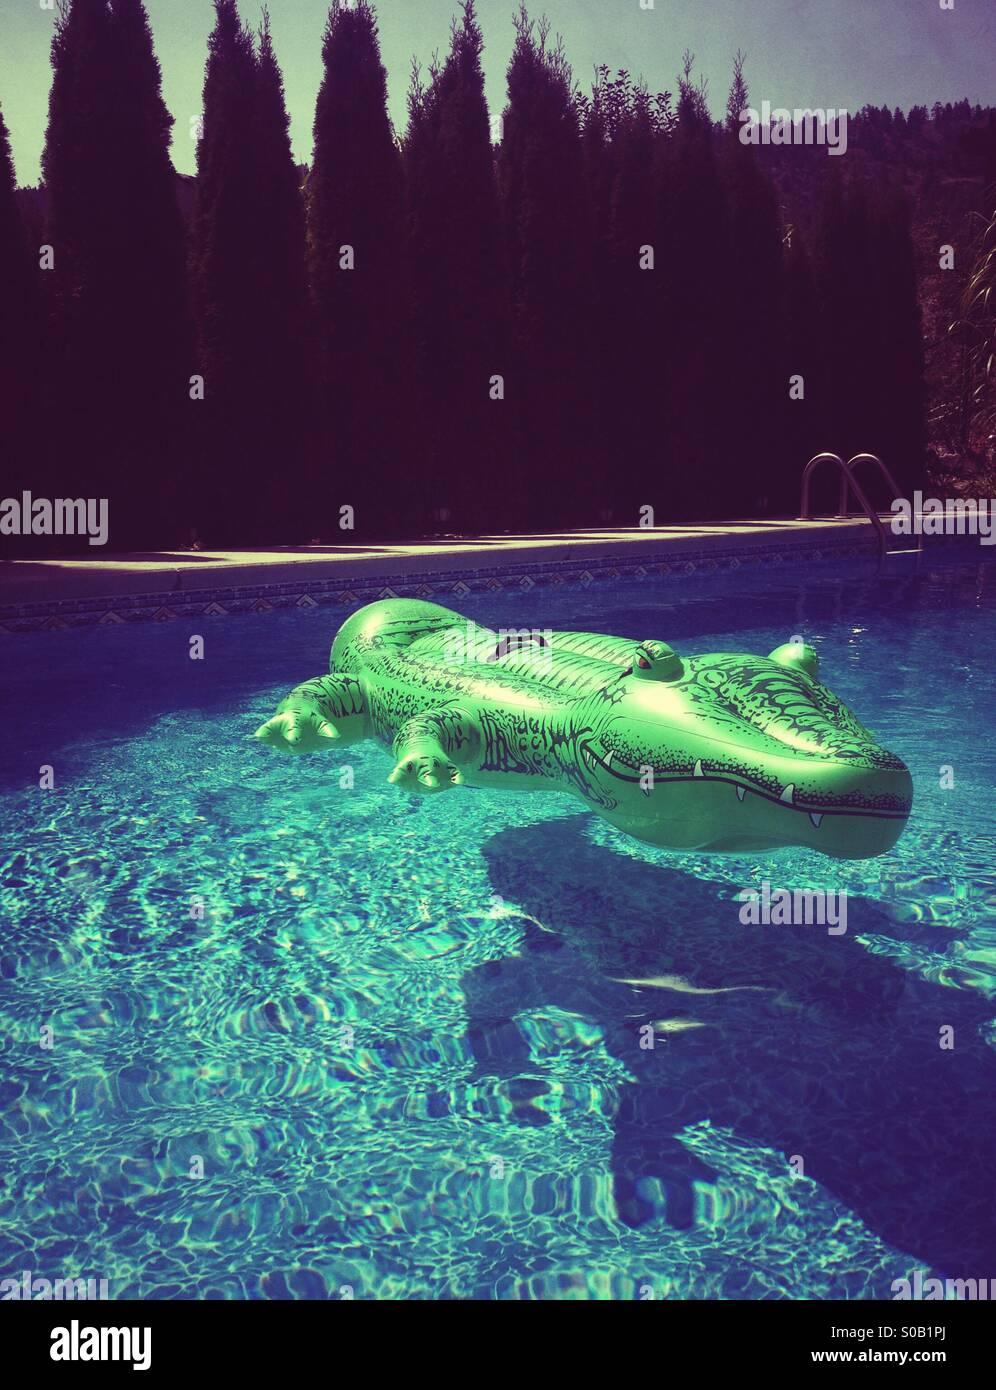 Inflatable Alligator Pool Toy Floating In Backyard Swimming Pool, Itu0027s  Shadow Beneath.